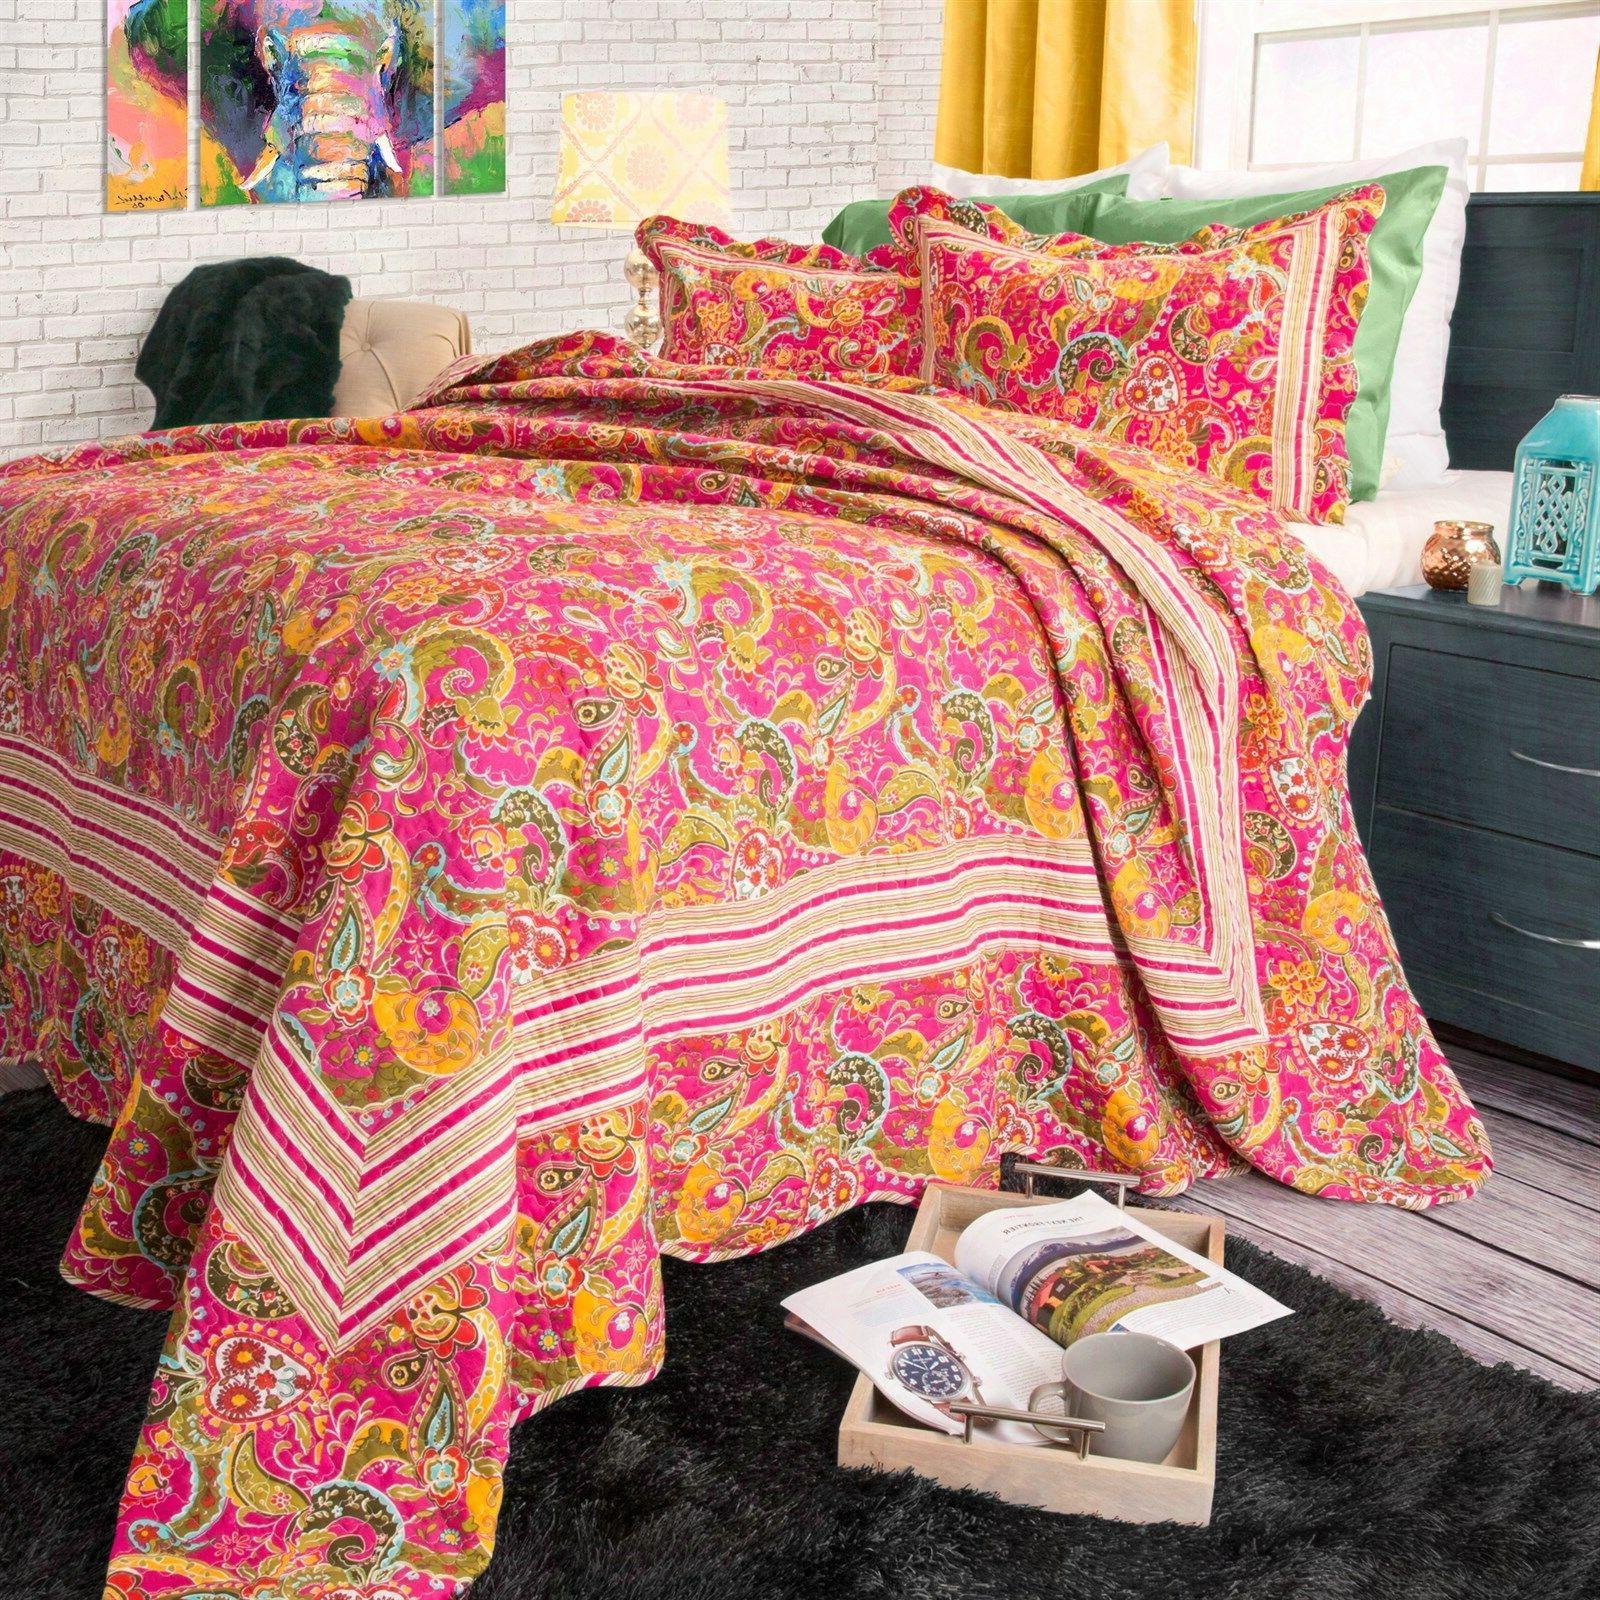 Lavish Home 3-Piece Paisley Quilt Set, Full/Queen